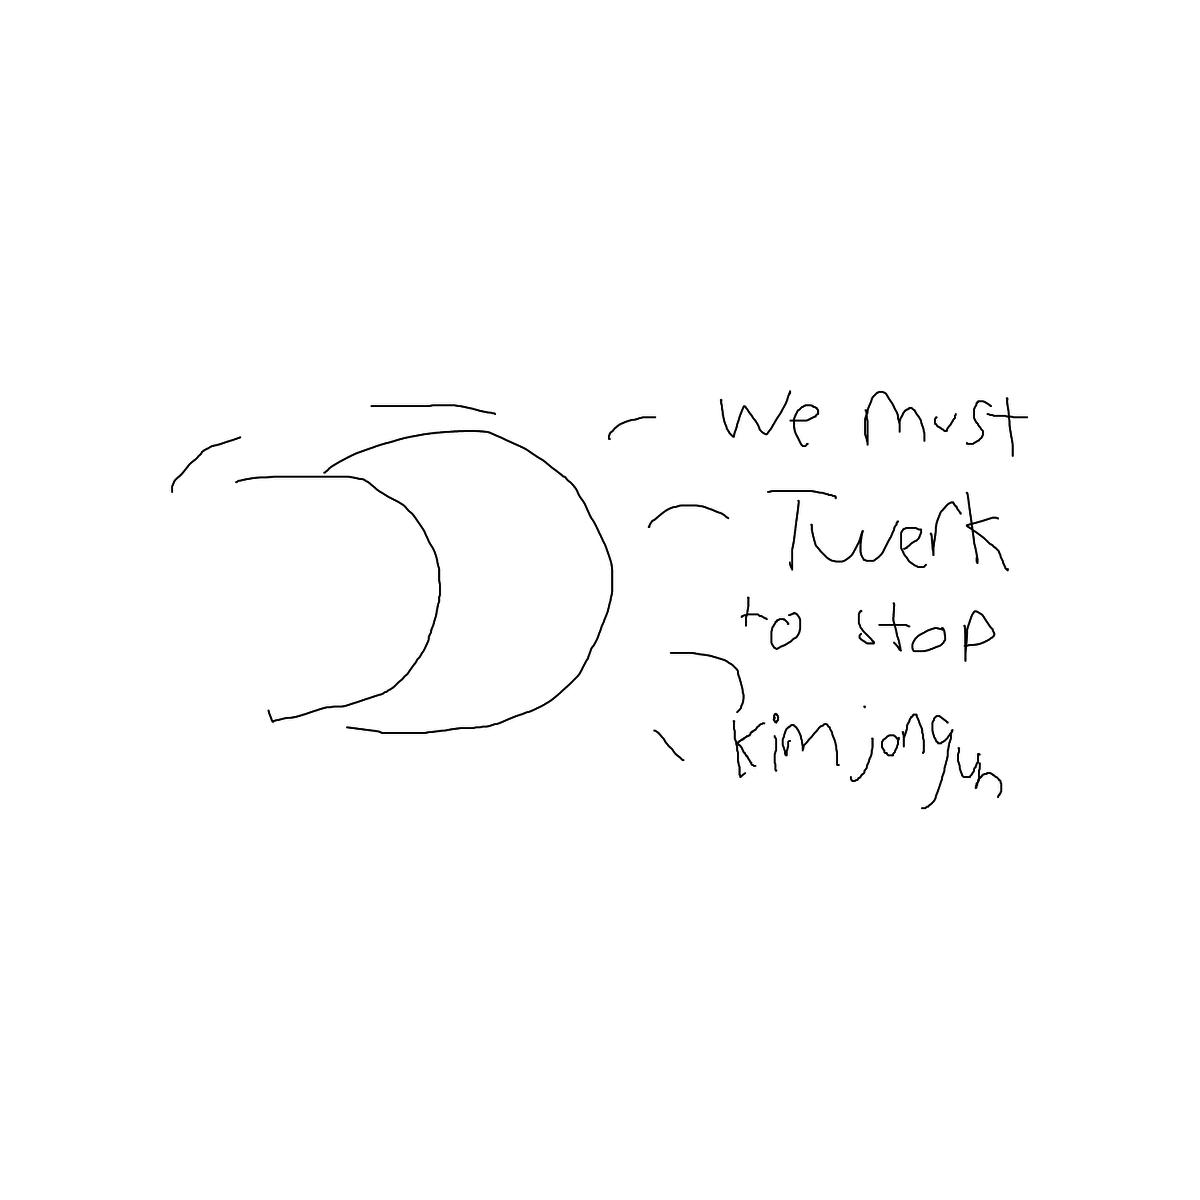 BAAAM drawing#9364 lat:39.7747726440429700lng: 125.8154296875000000